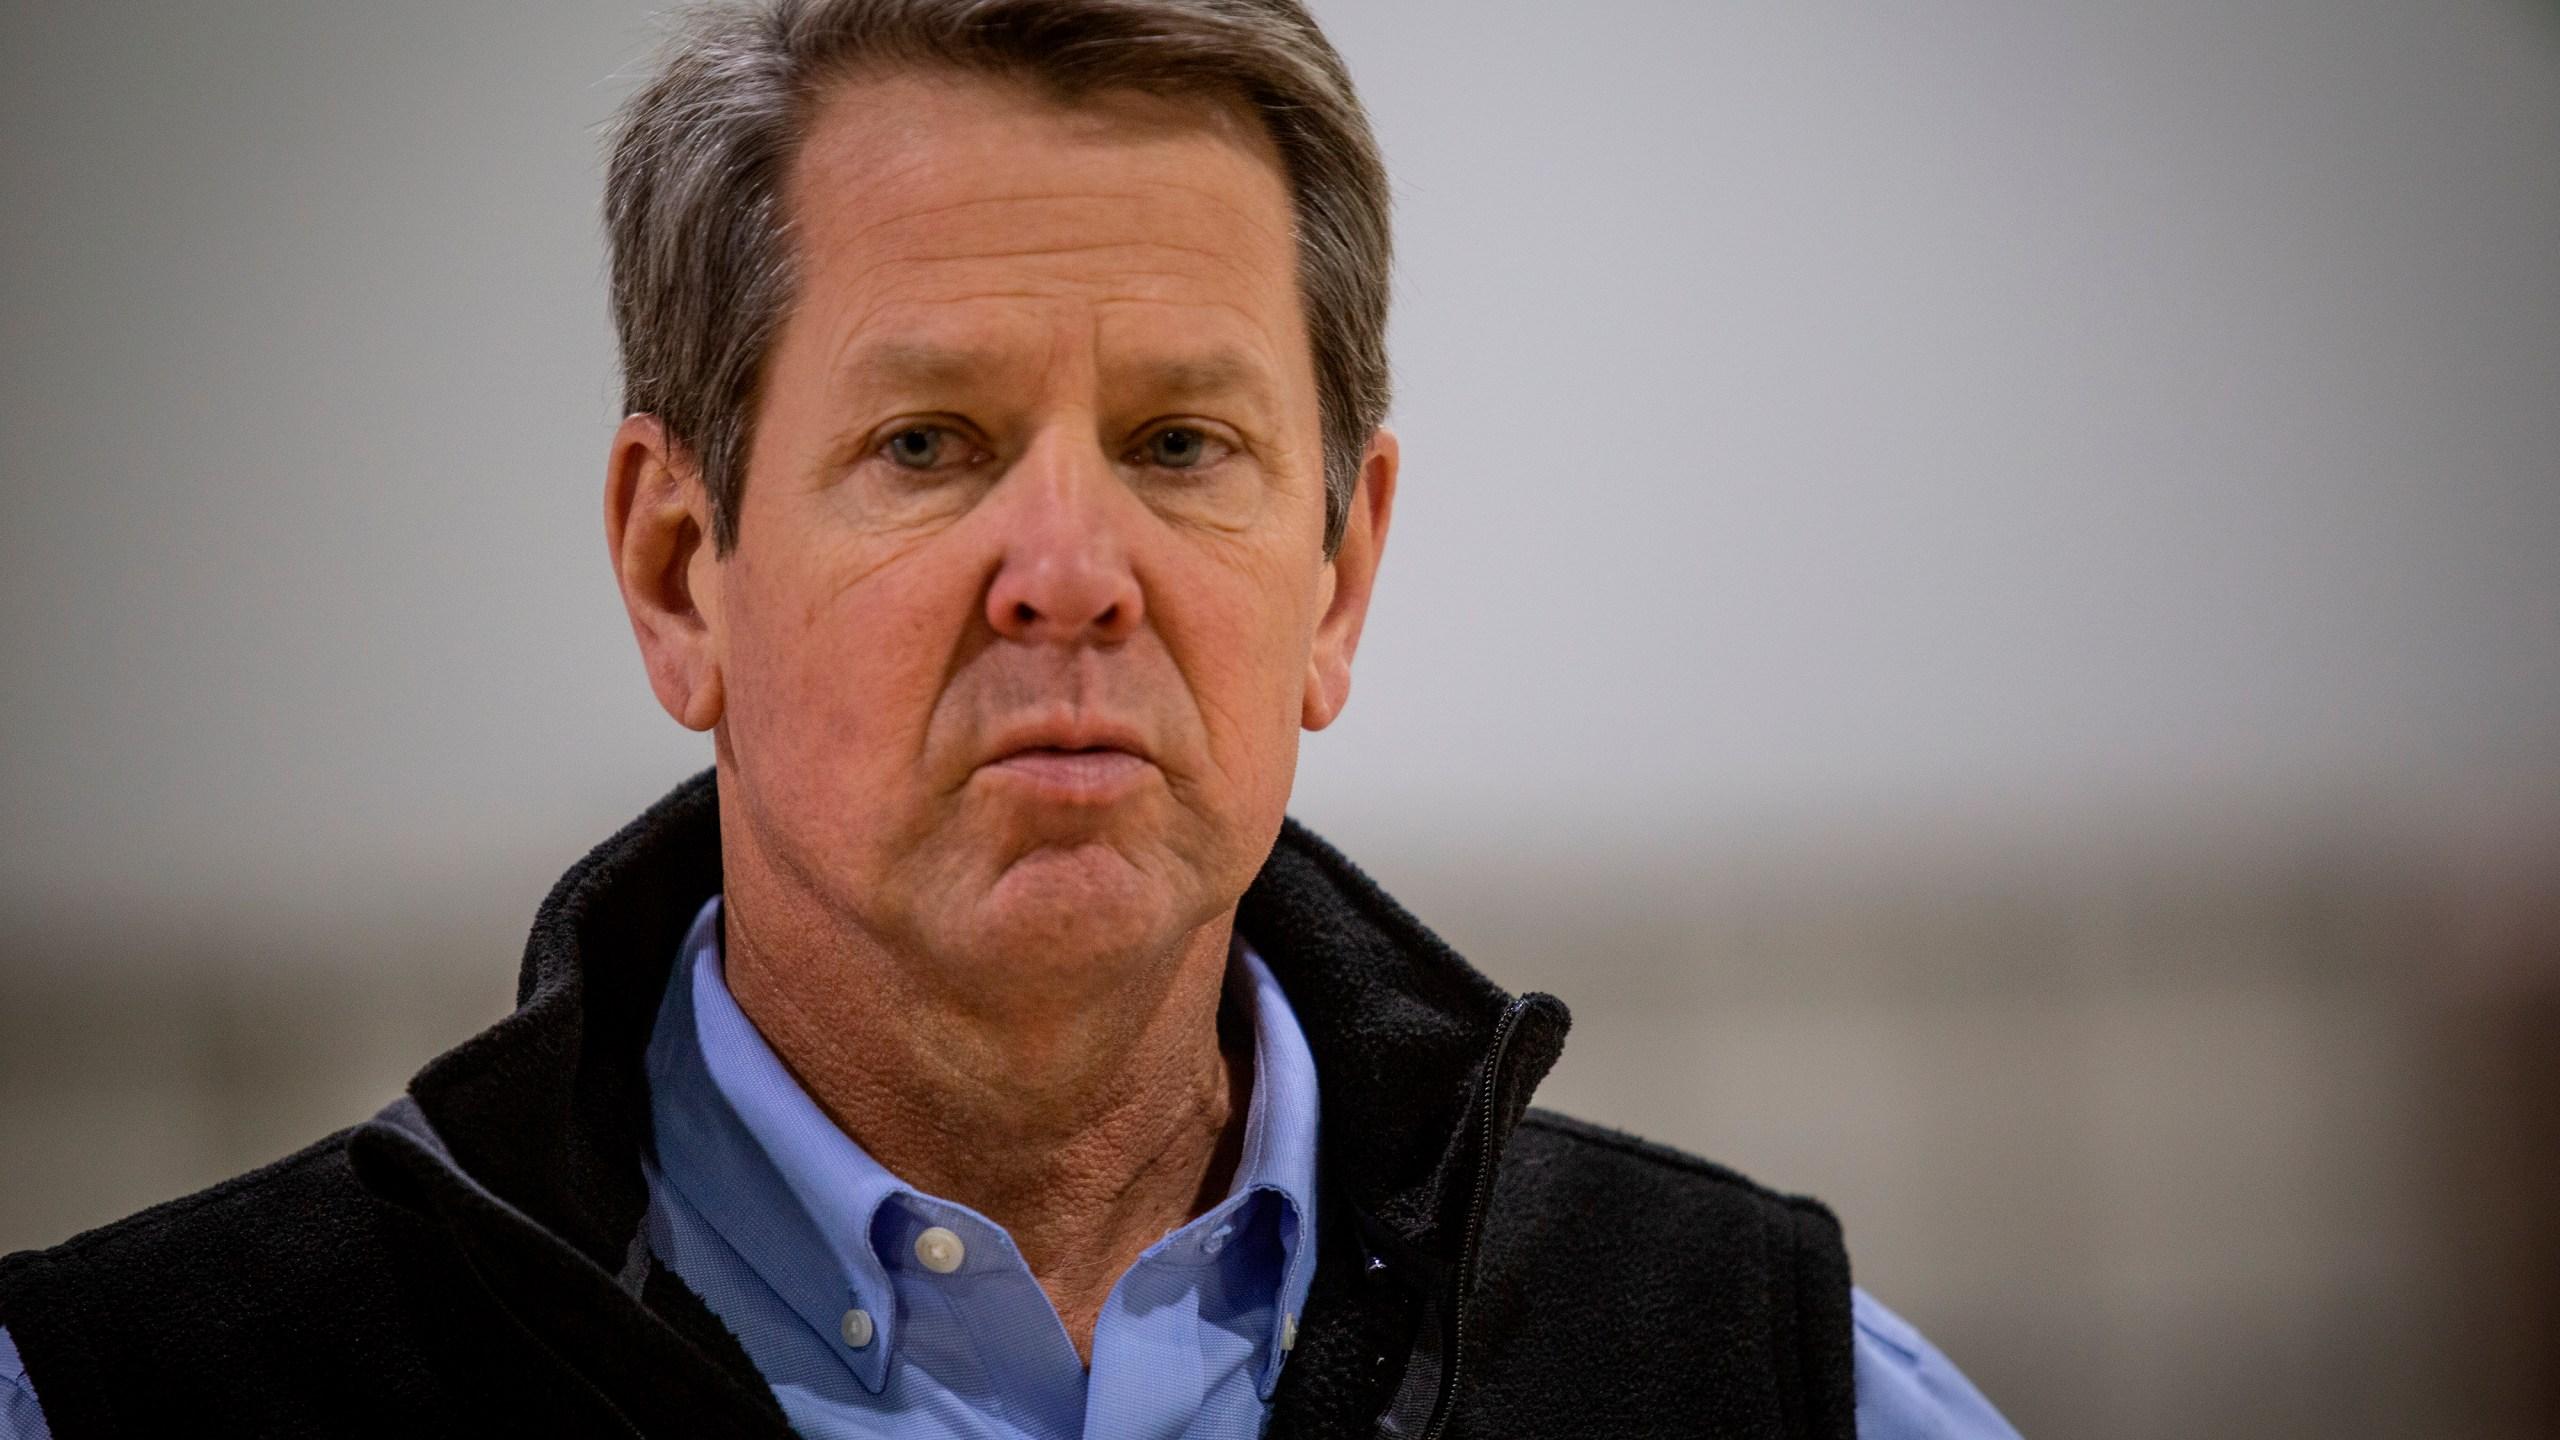 Gov. Kemp takes tour of massive temporary hospital